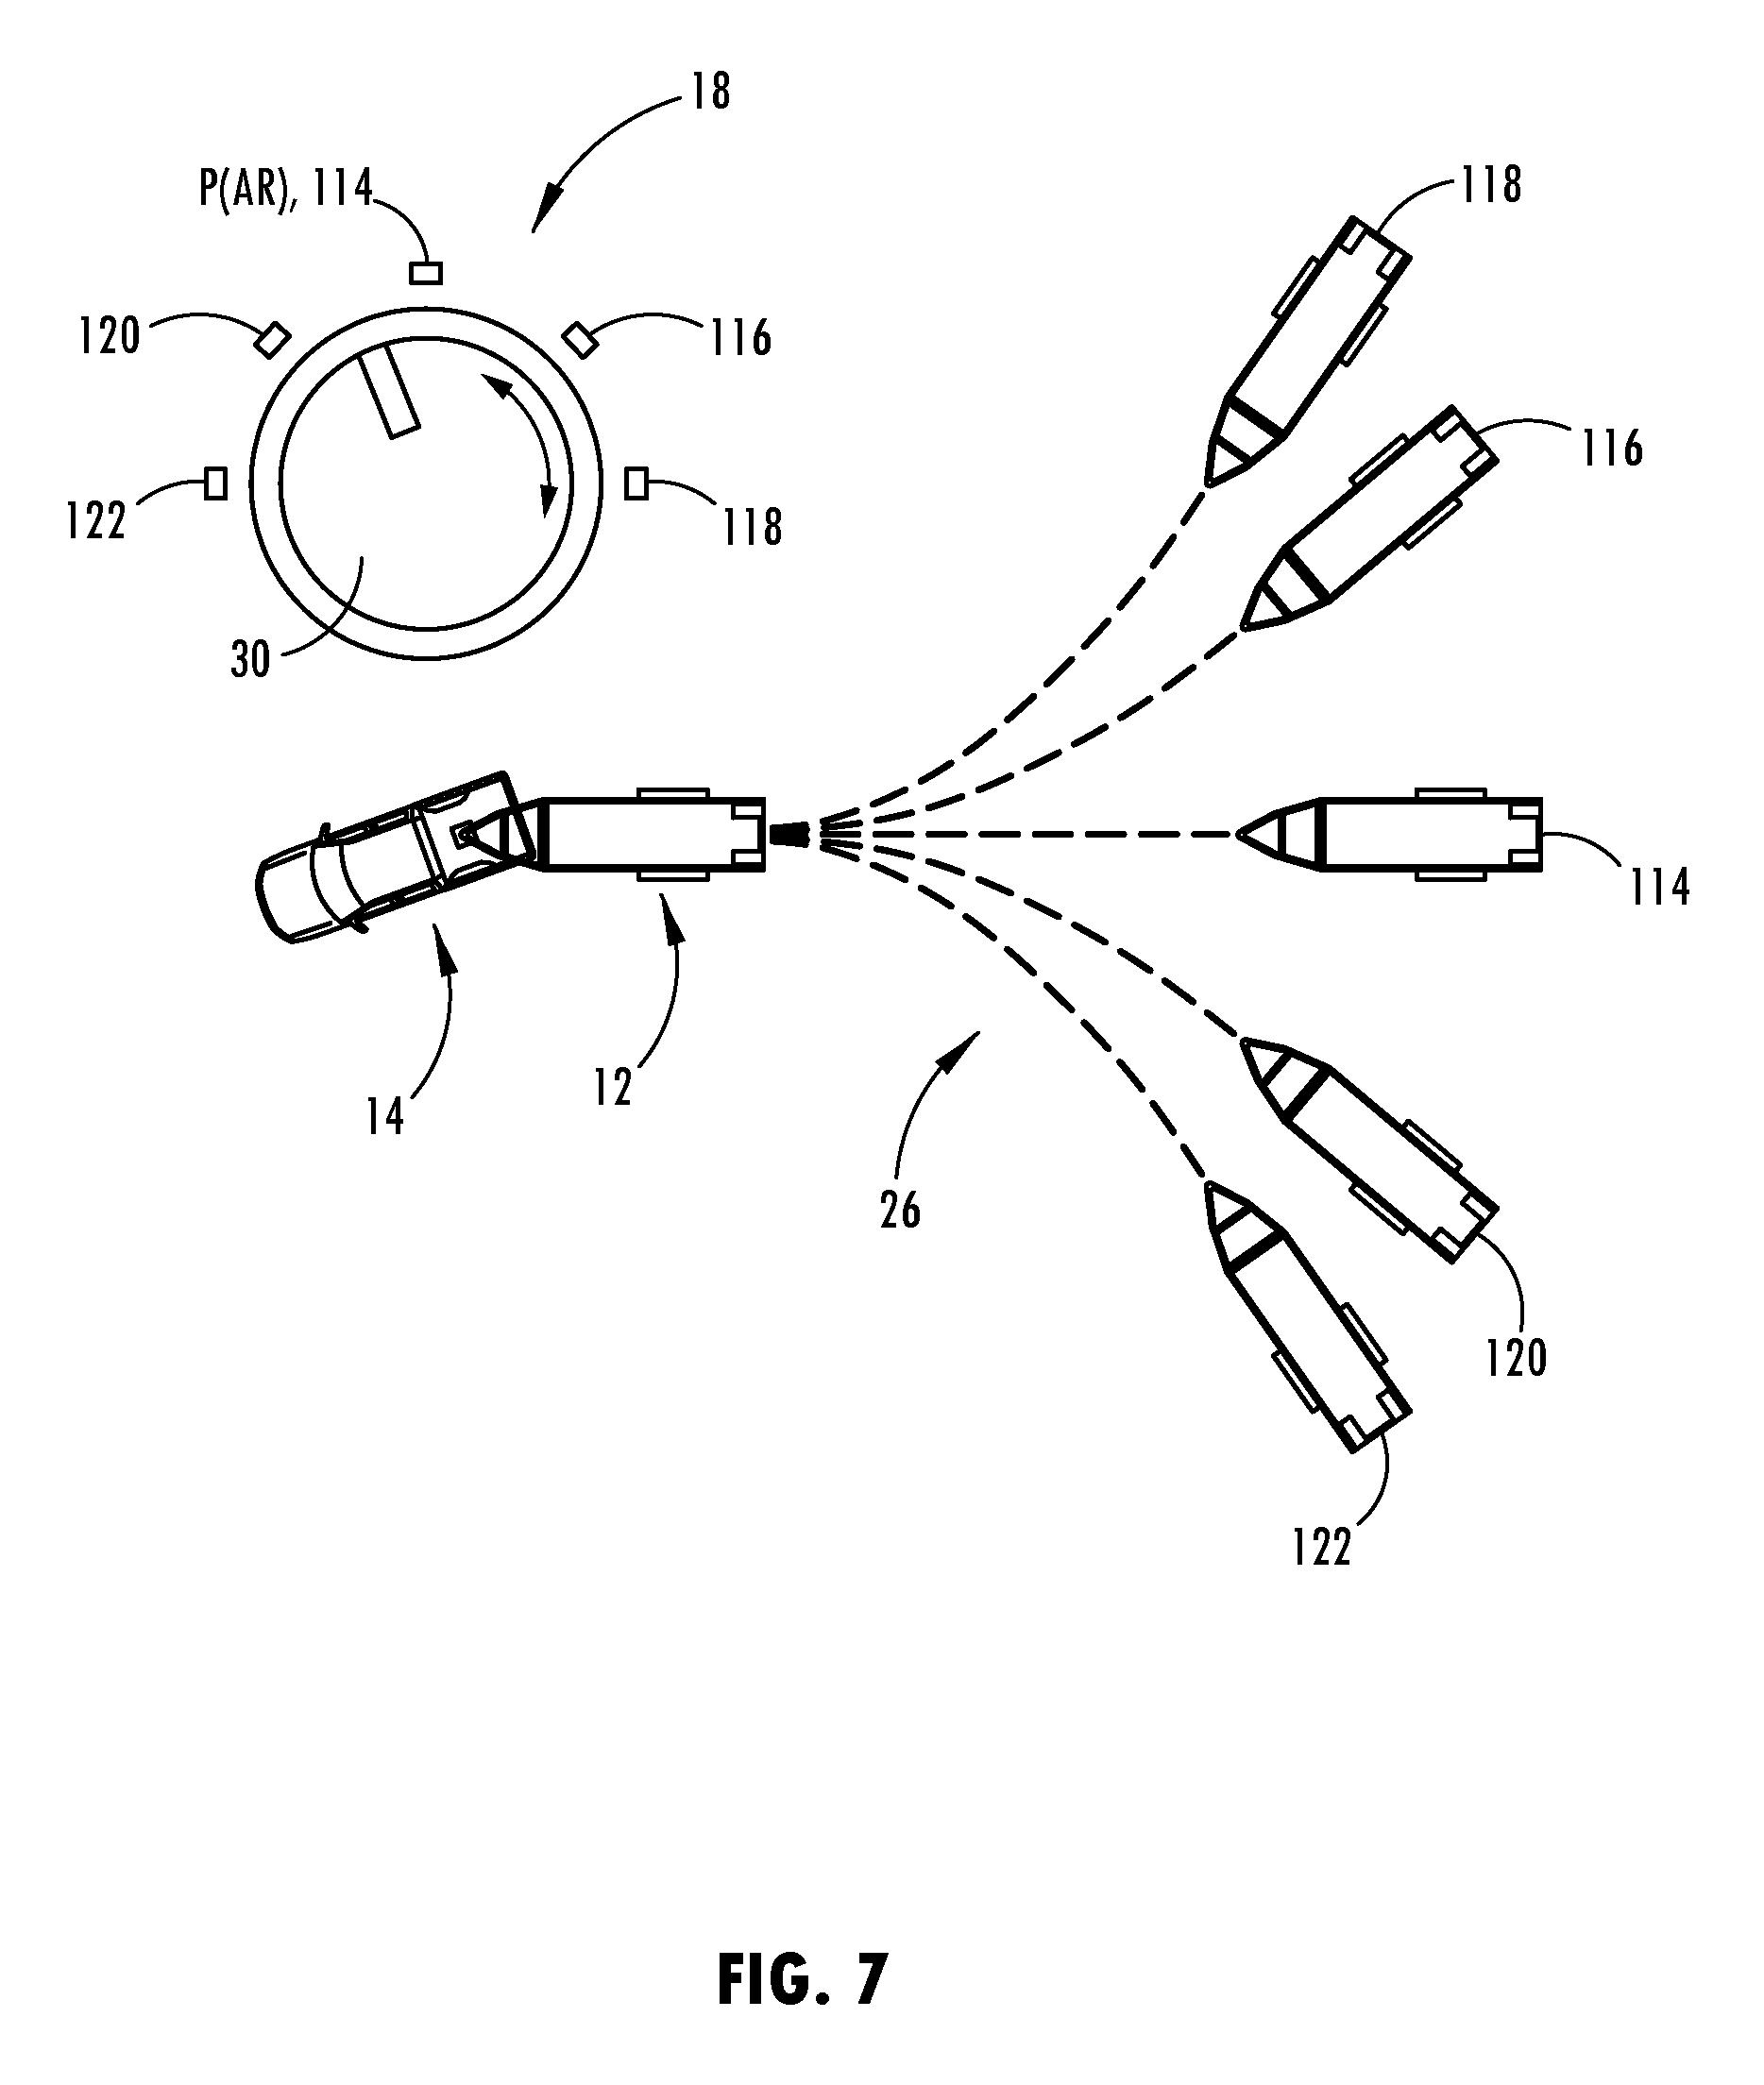 patent us 9 517 668 b2 Tailgate Graphic patent